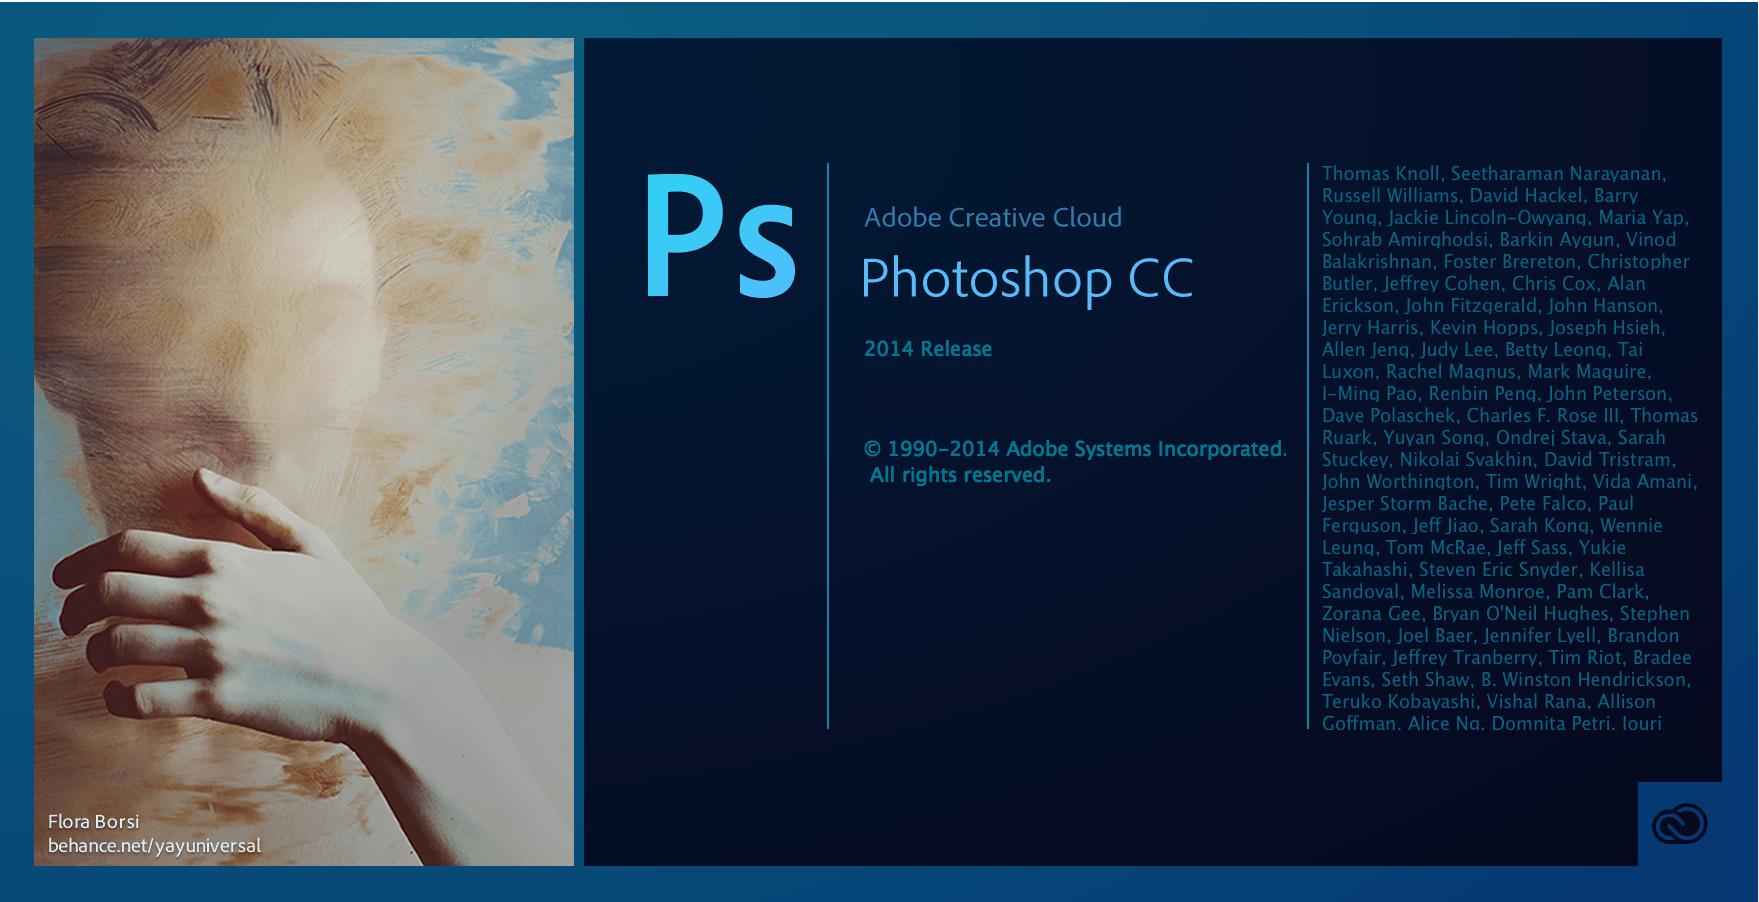 Adobe Photoshop CC 2015.0.0 - x86/x64 Full